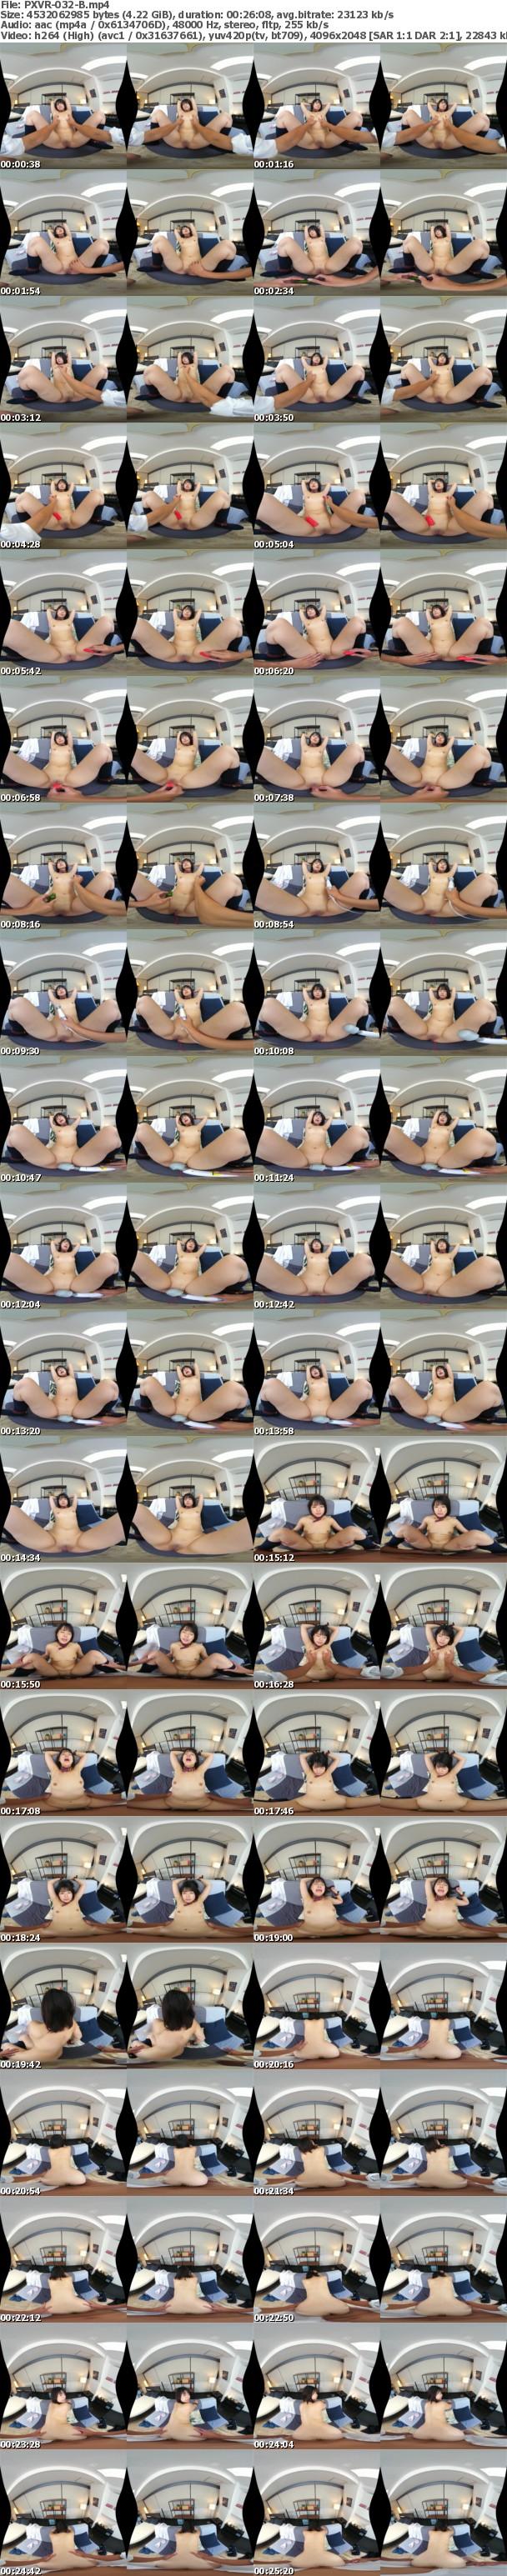 (VR) PXVR-032 キラキラJ●の裏の顔 変態オヤジに中出しされる訳ありいいなり性処理人形 丘えりな